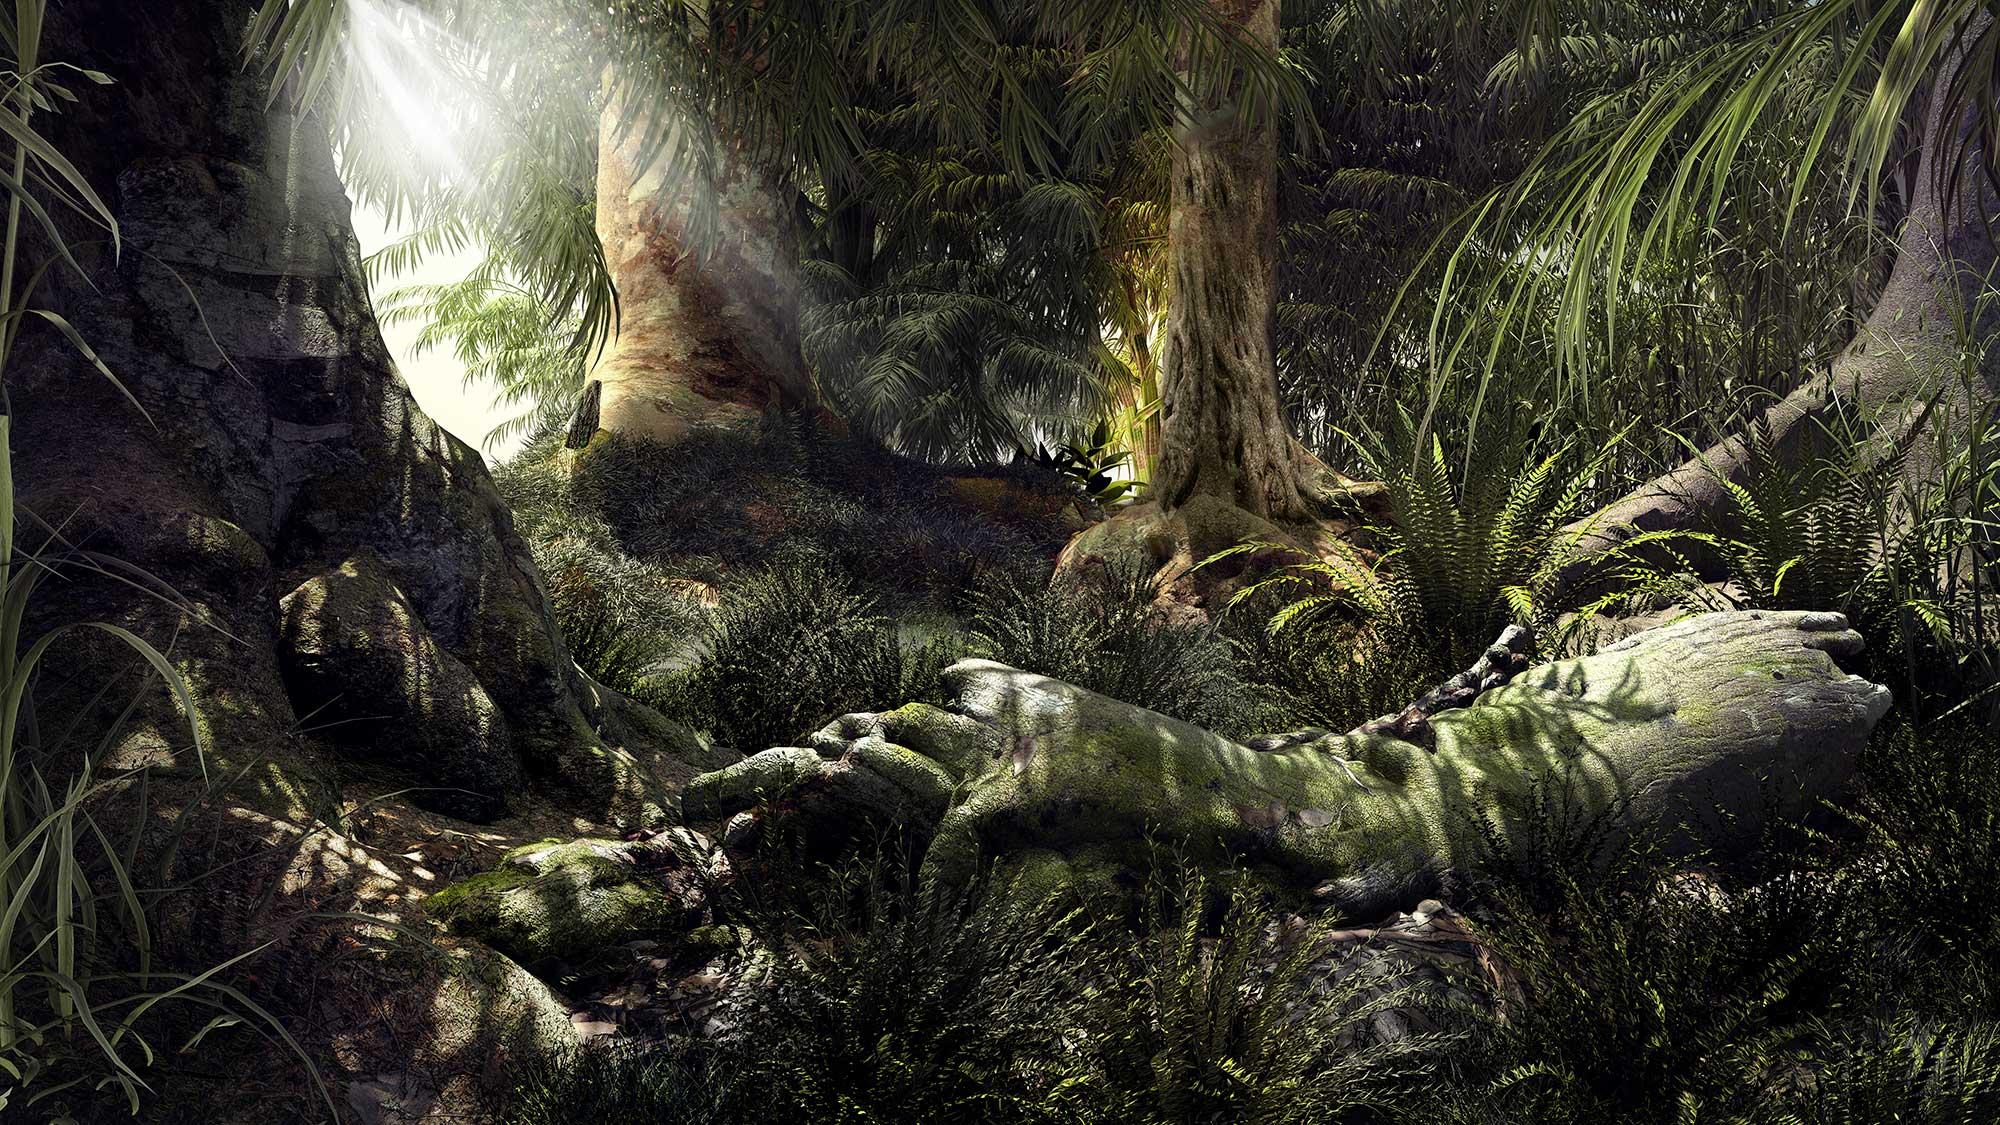 jungle 3d cgi Luzzitelli Danieli productions